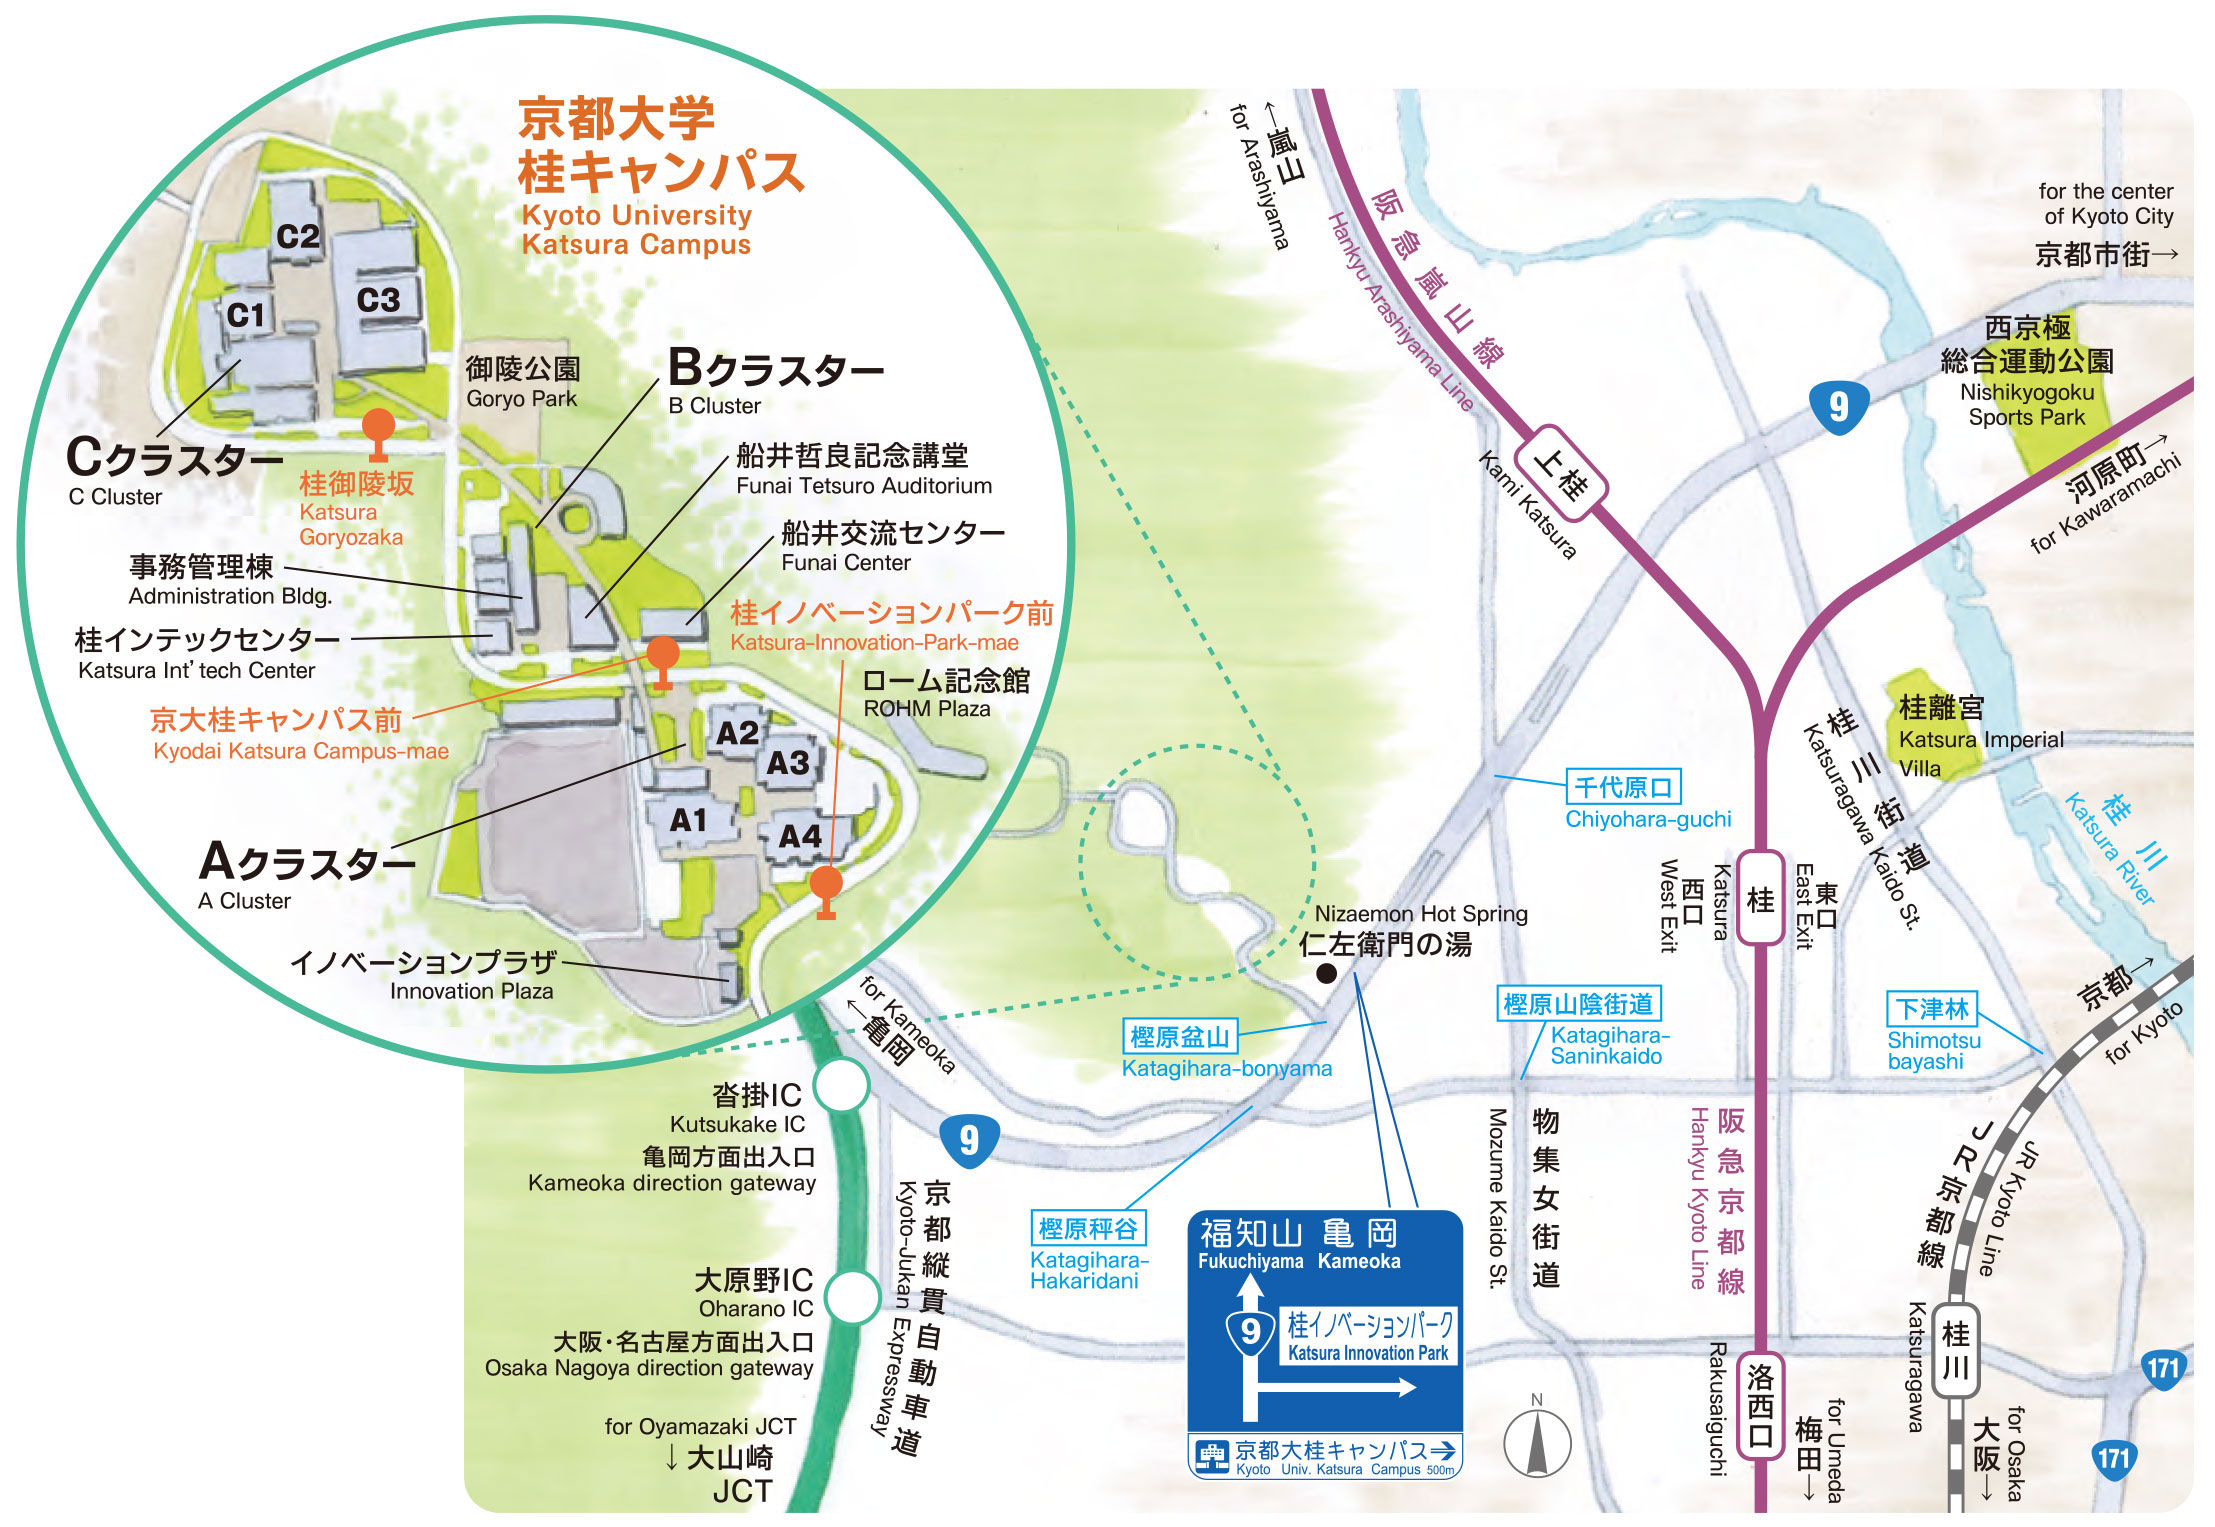 katsura_map_桂周辺.jpg